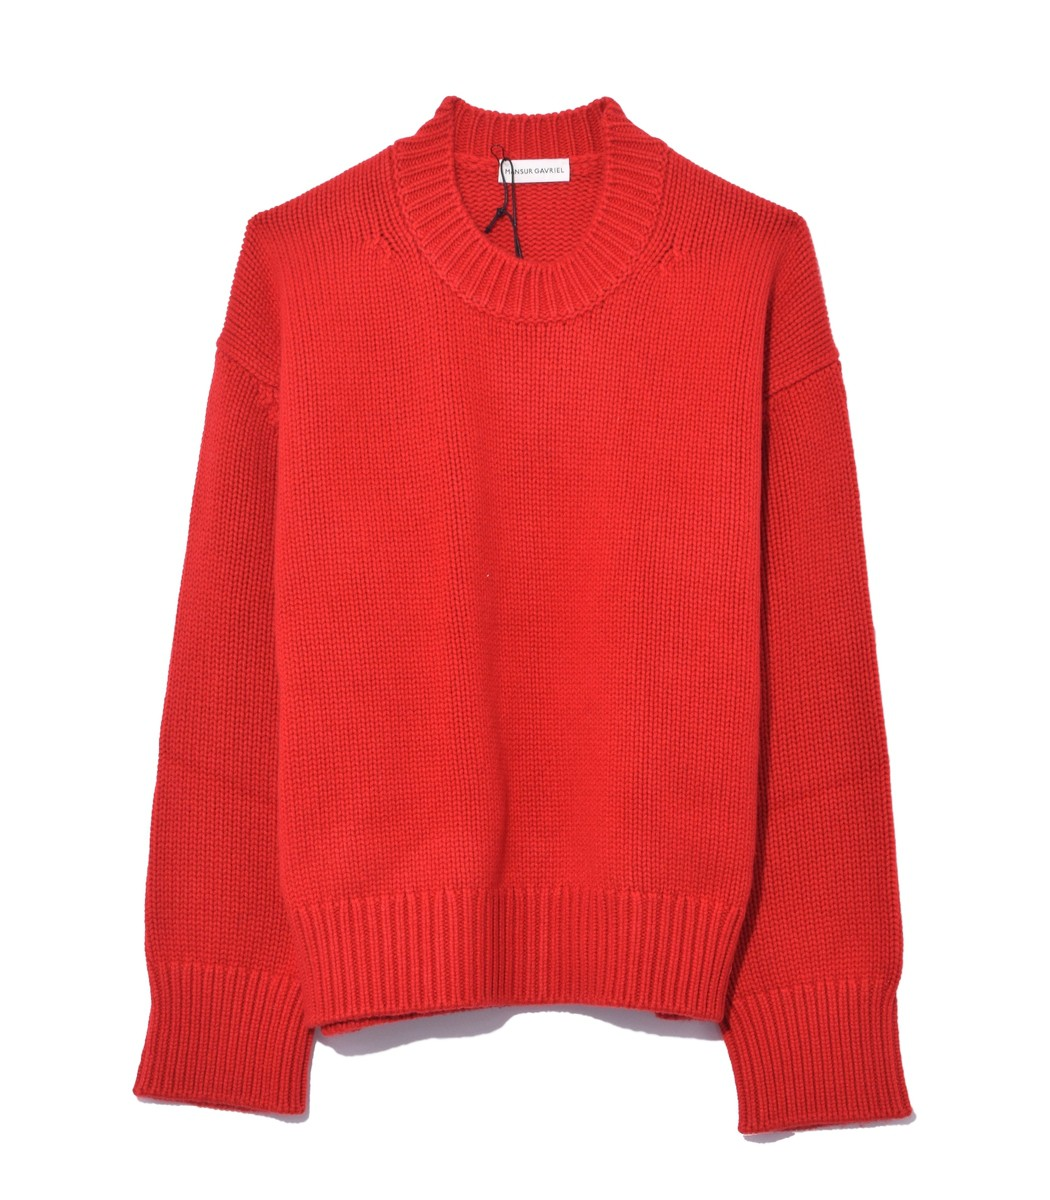 Red Flamma Cashmere Oversized Crewneck Sweater